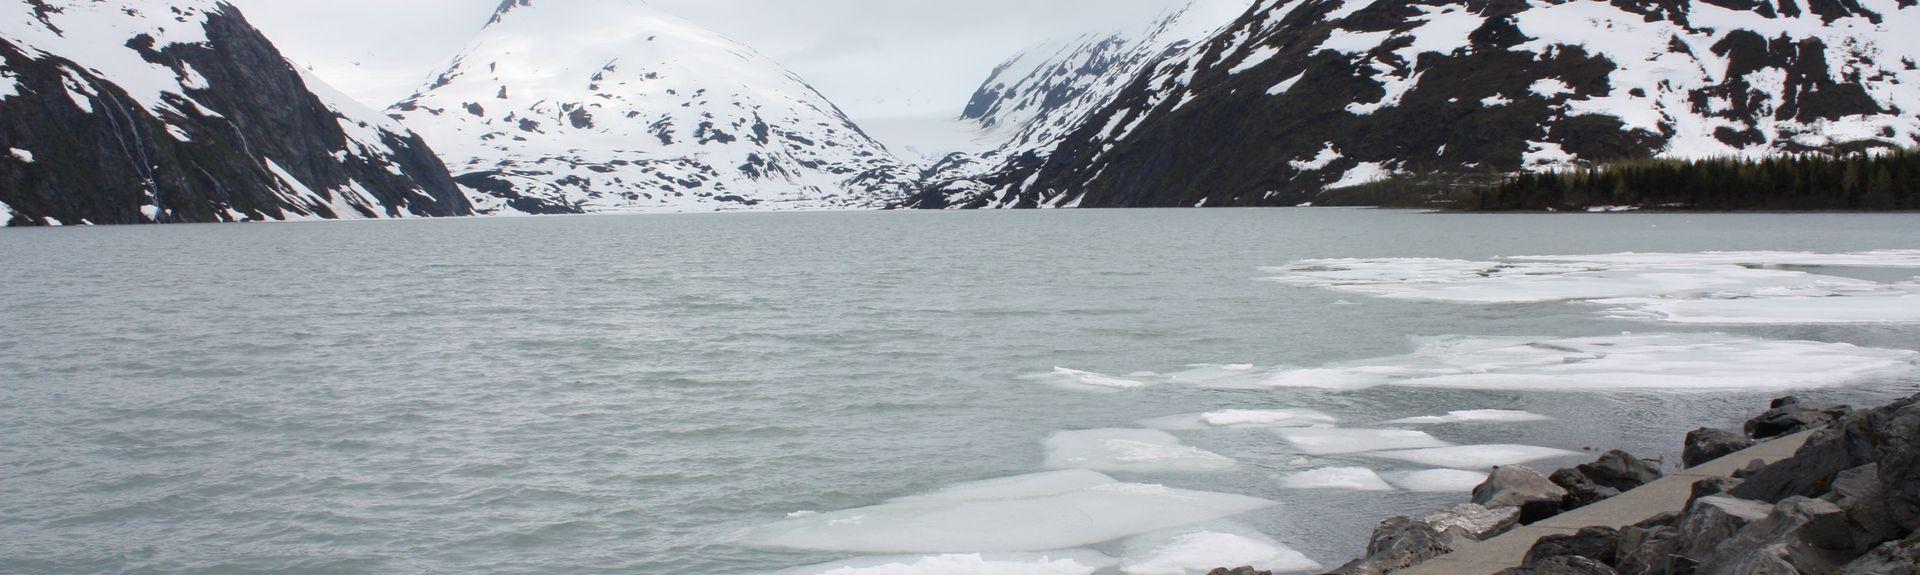 Turnagain, Anchorage, Alaska, USA